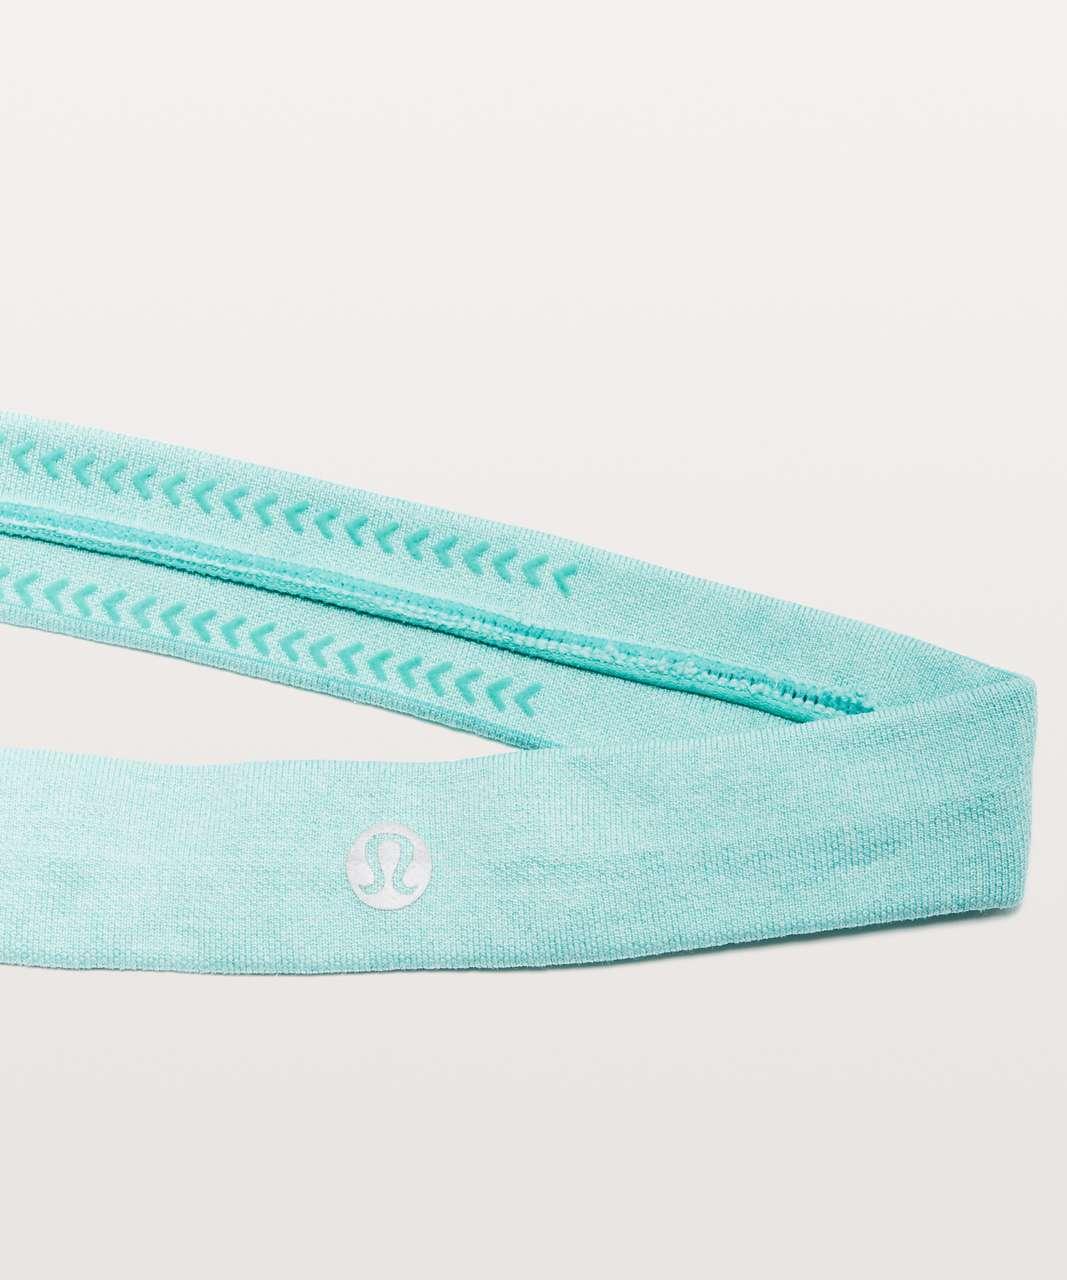 Lululemon Cardio Cross Trainer Headband - Bali Breeze / White